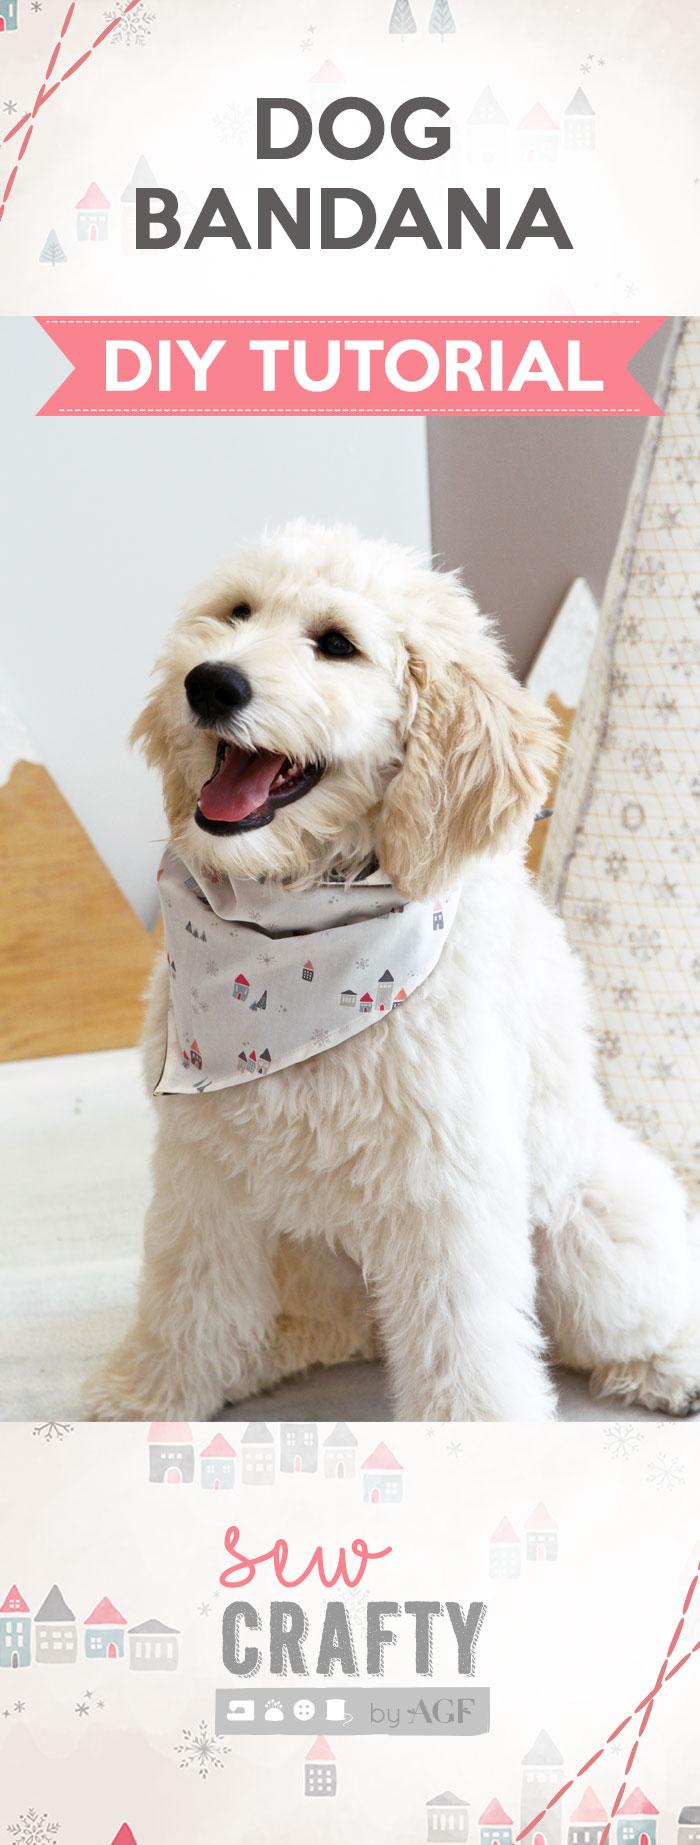 Dog Bandana Diy How To Make A Cute Dog Scarf Sew Crafty